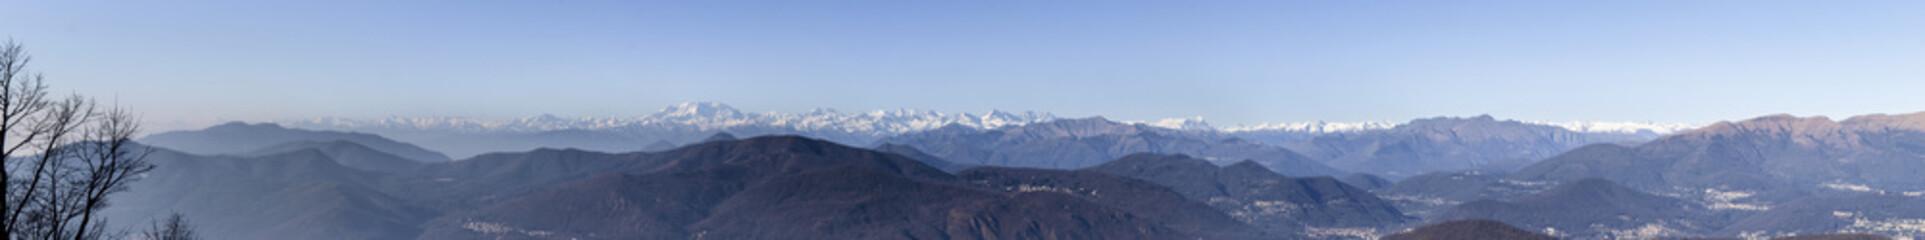 Panoramic view from Monte San Giorgio